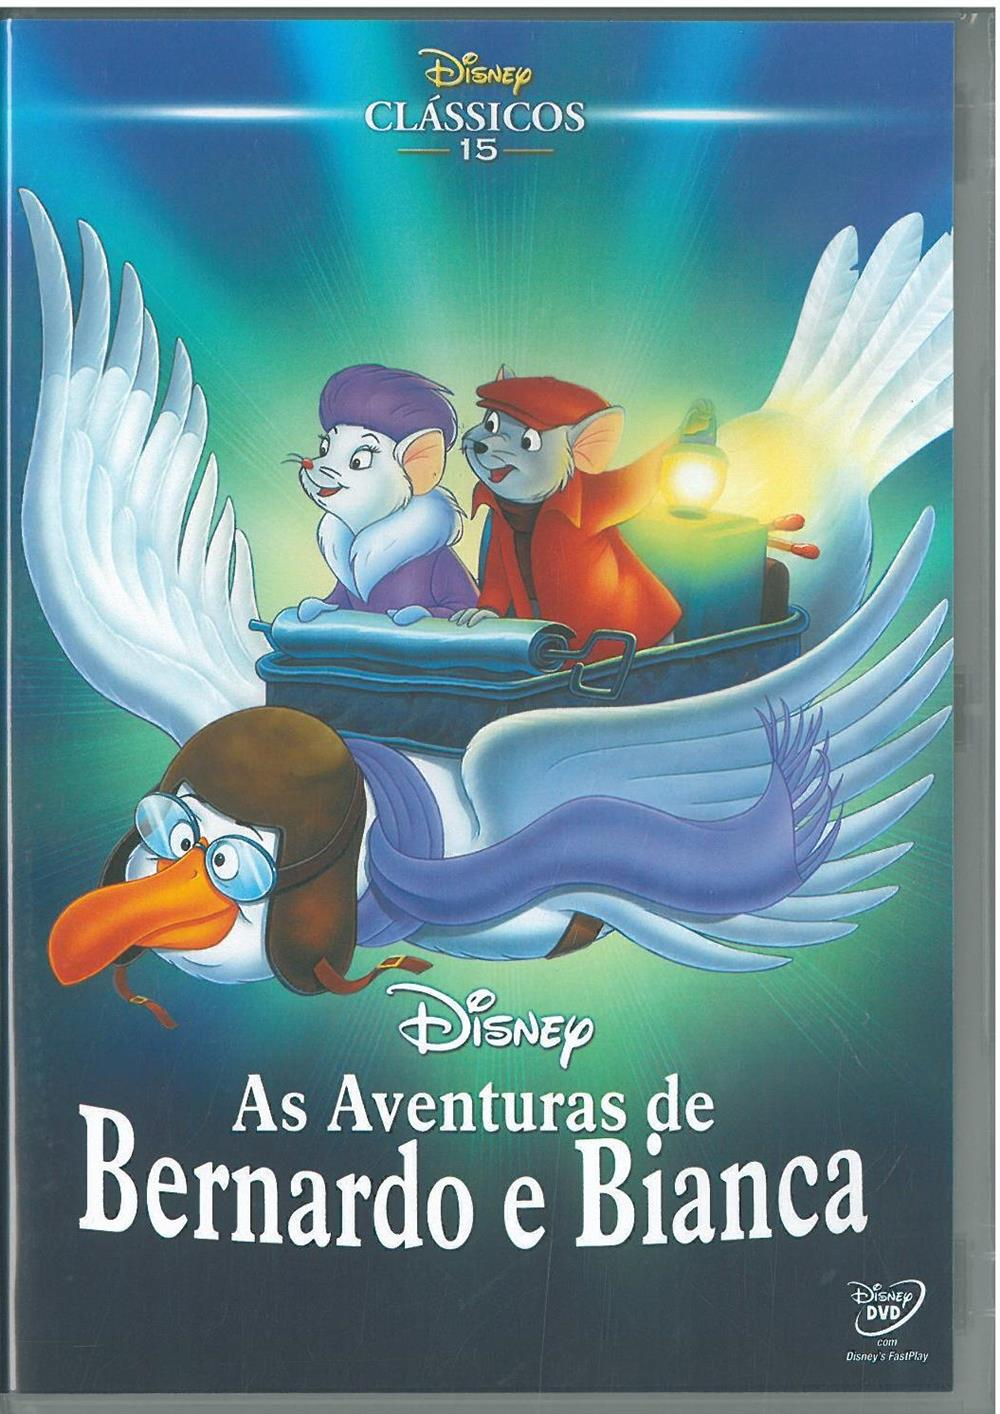 As aventuras de Bernardo e Bianca_DVD.jpg